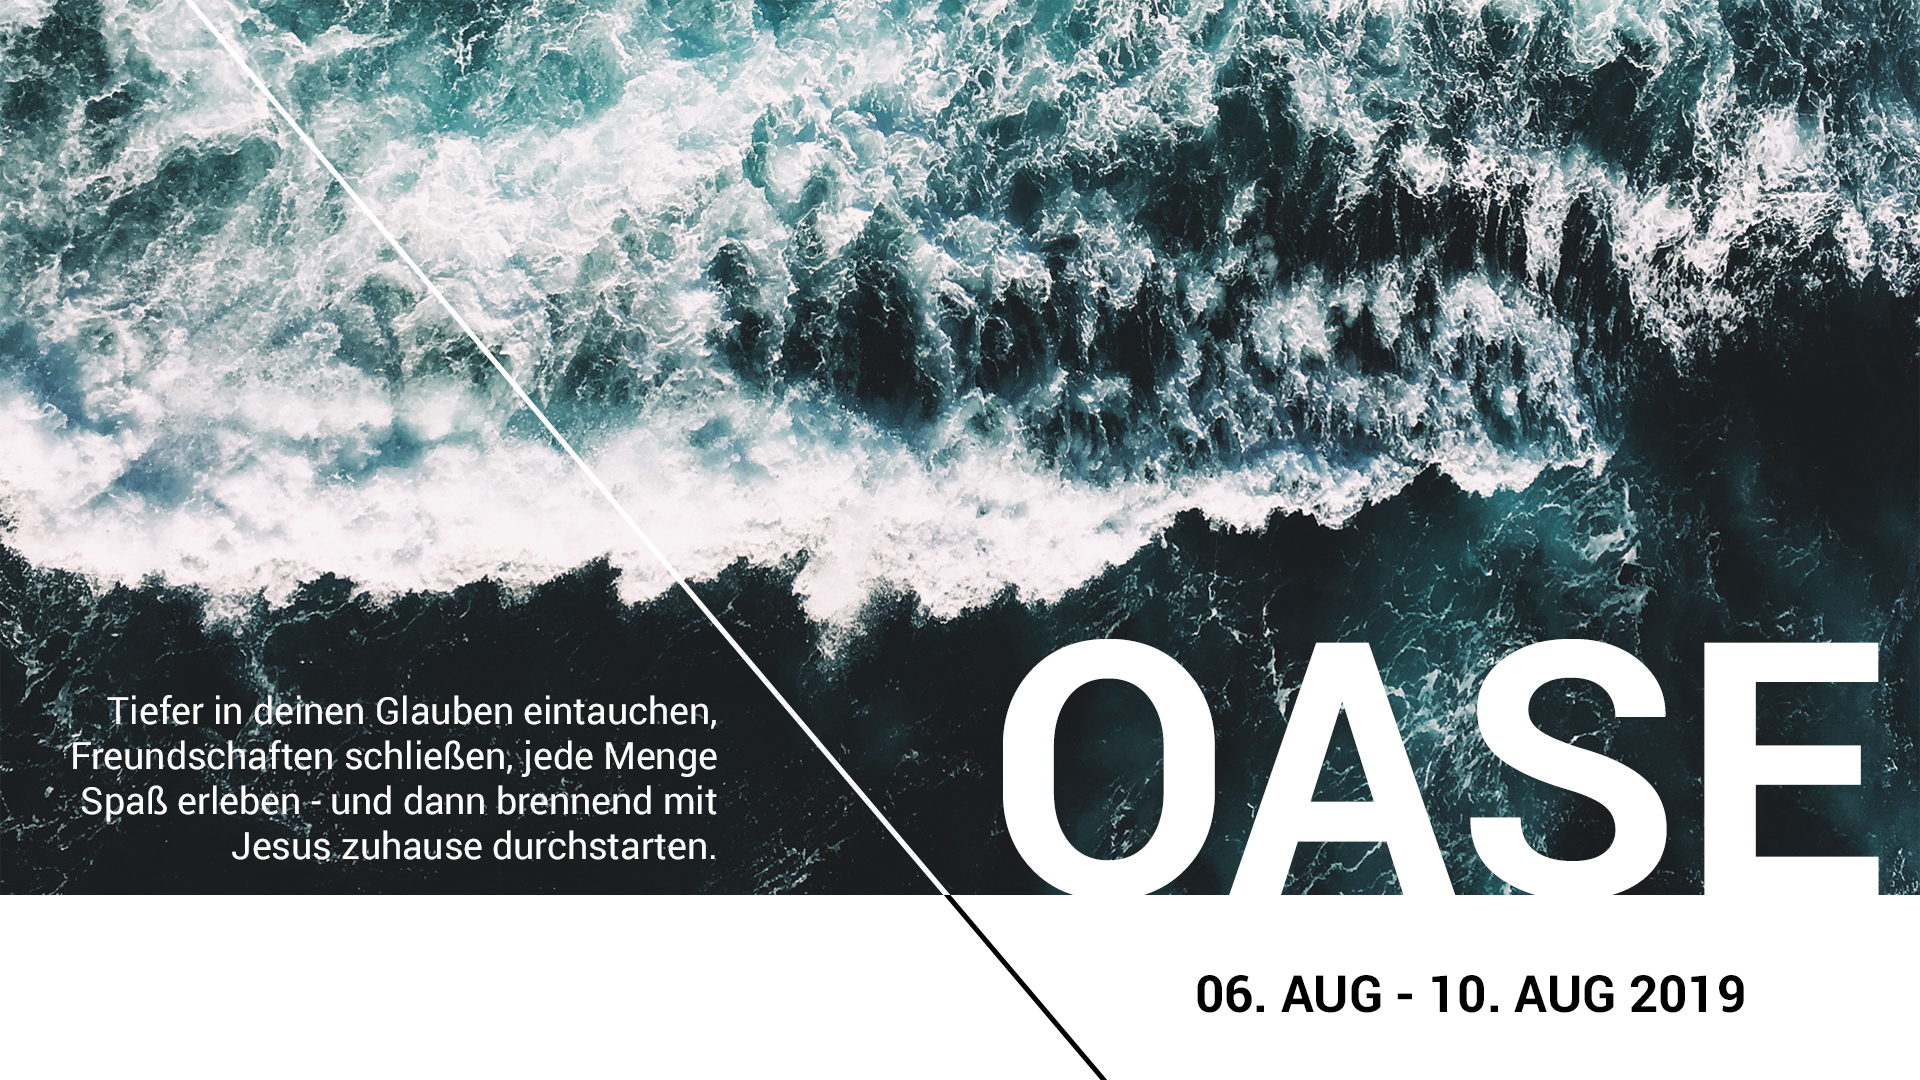 OASE2019widescreen.jpg